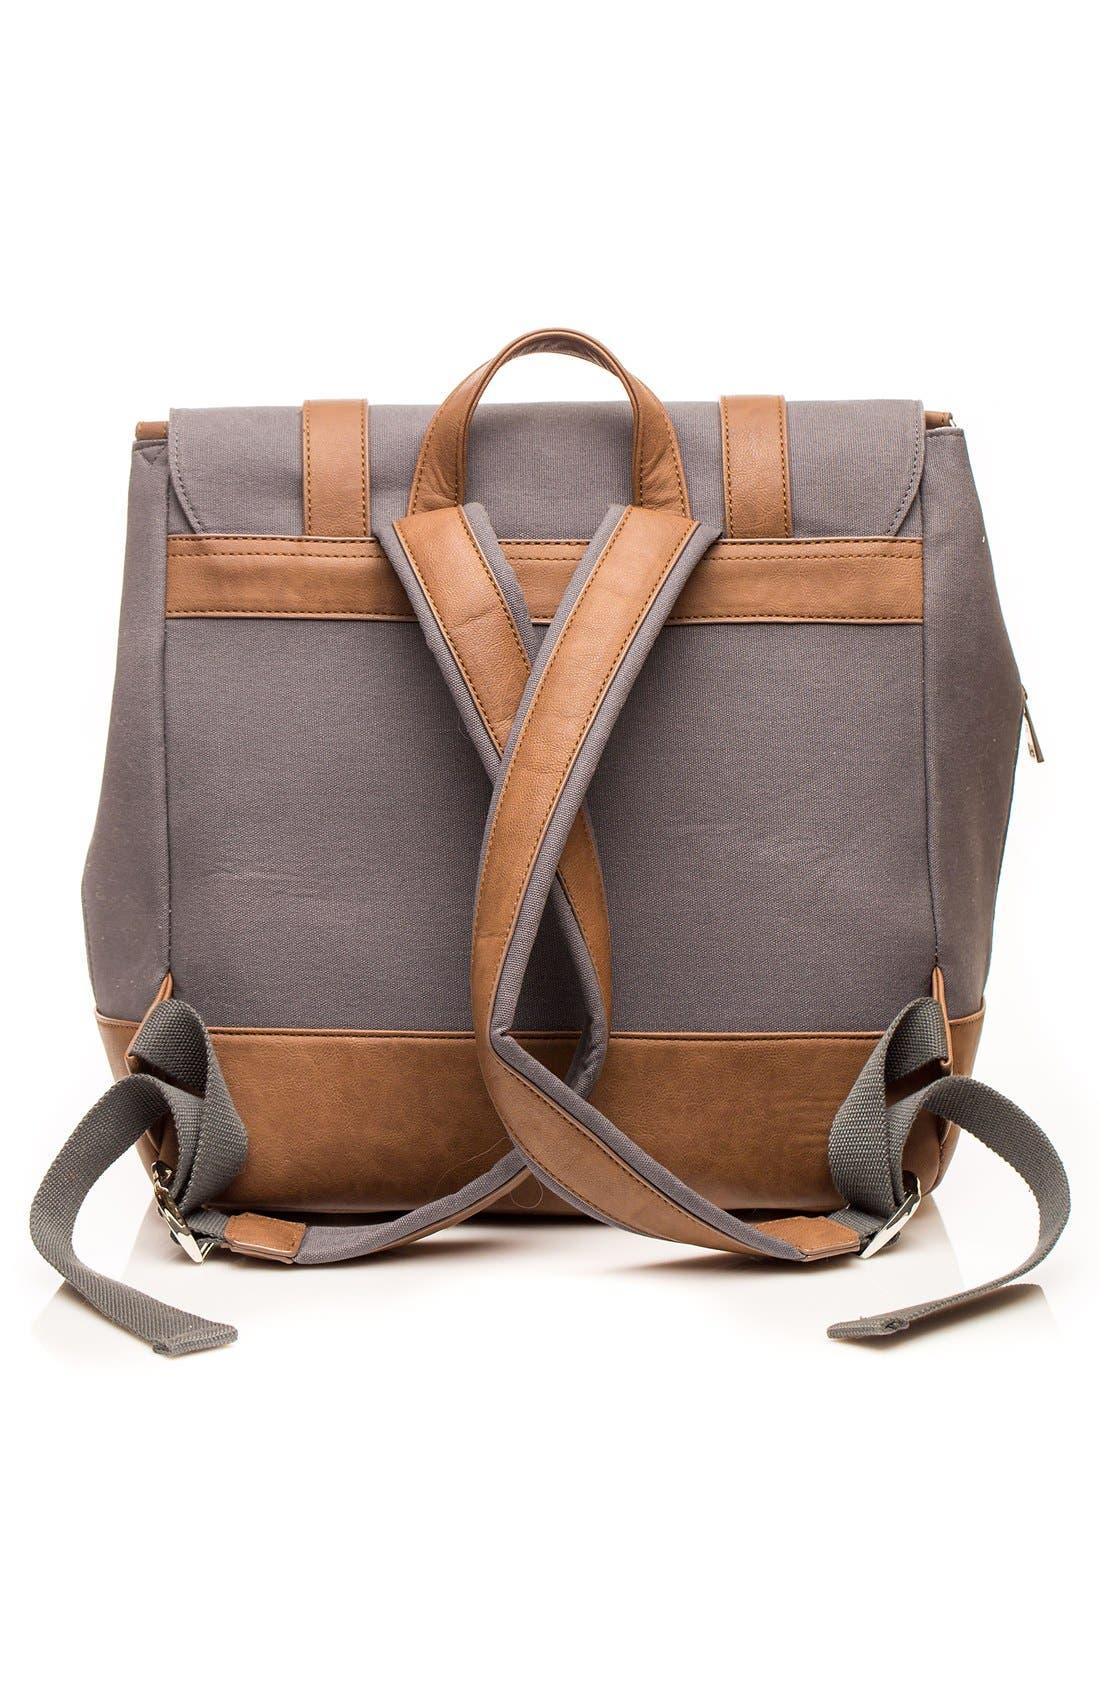 Marindale Diaper Backpack,                             Alternate thumbnail 2, color,                             Grey